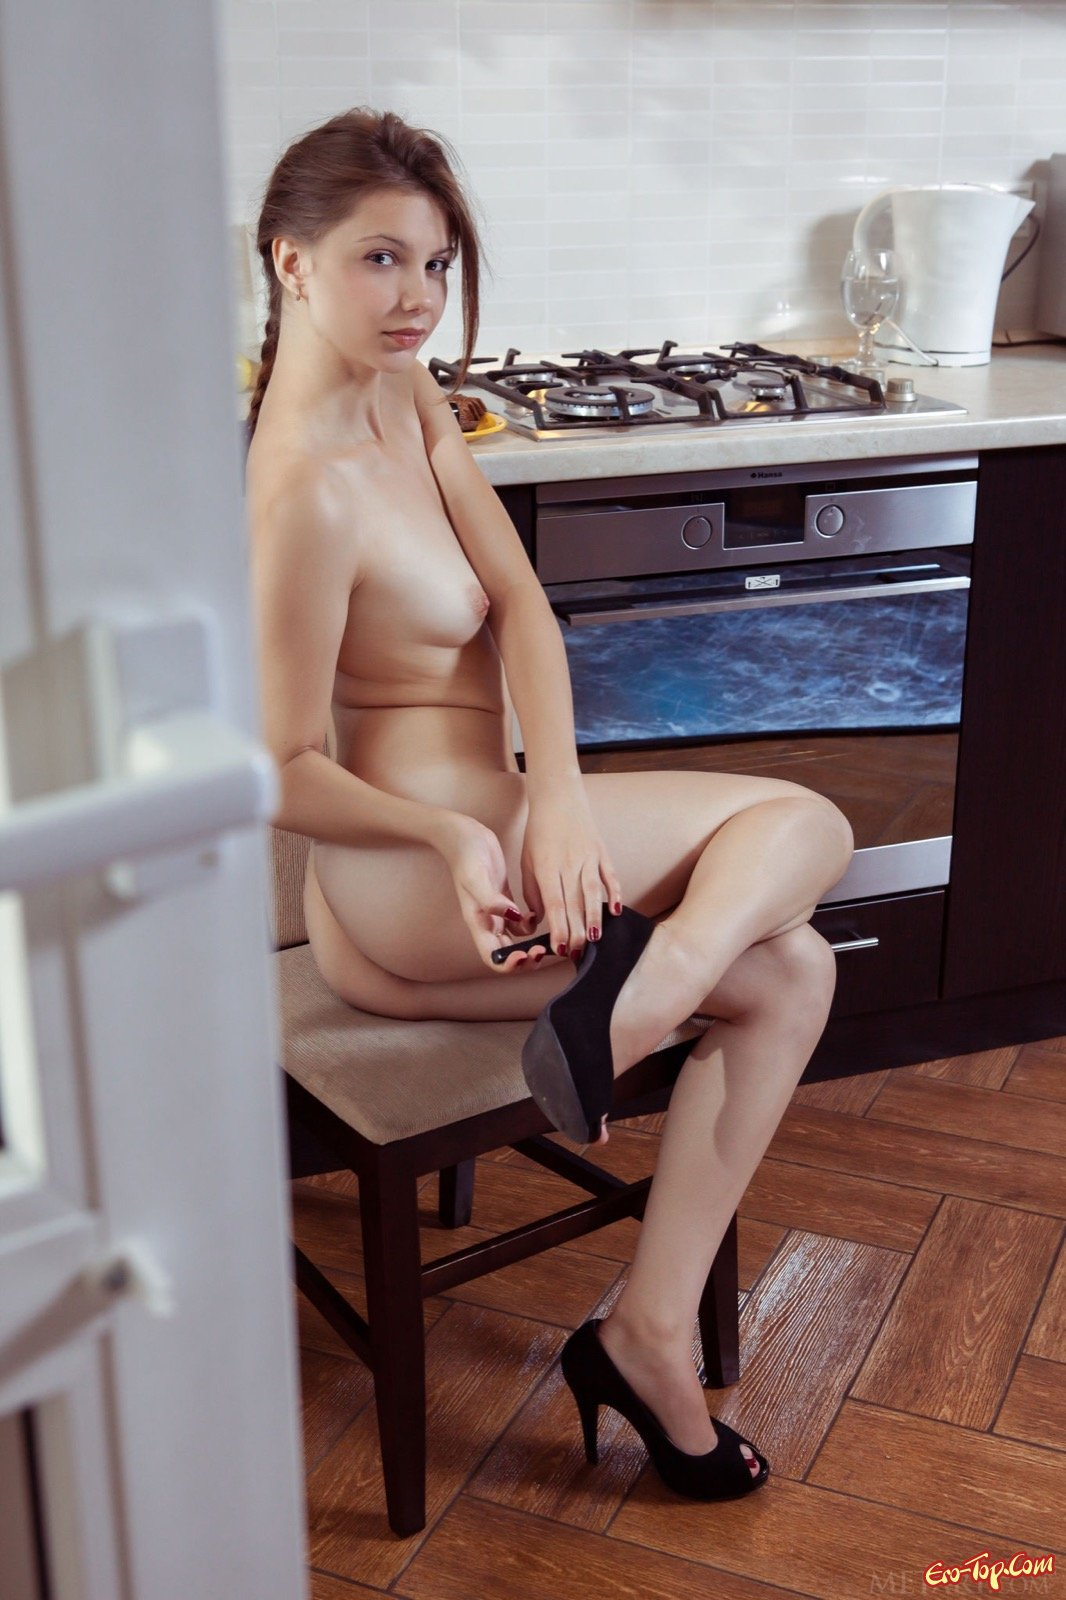 Путана сняла платье и спустила бикини на кухне